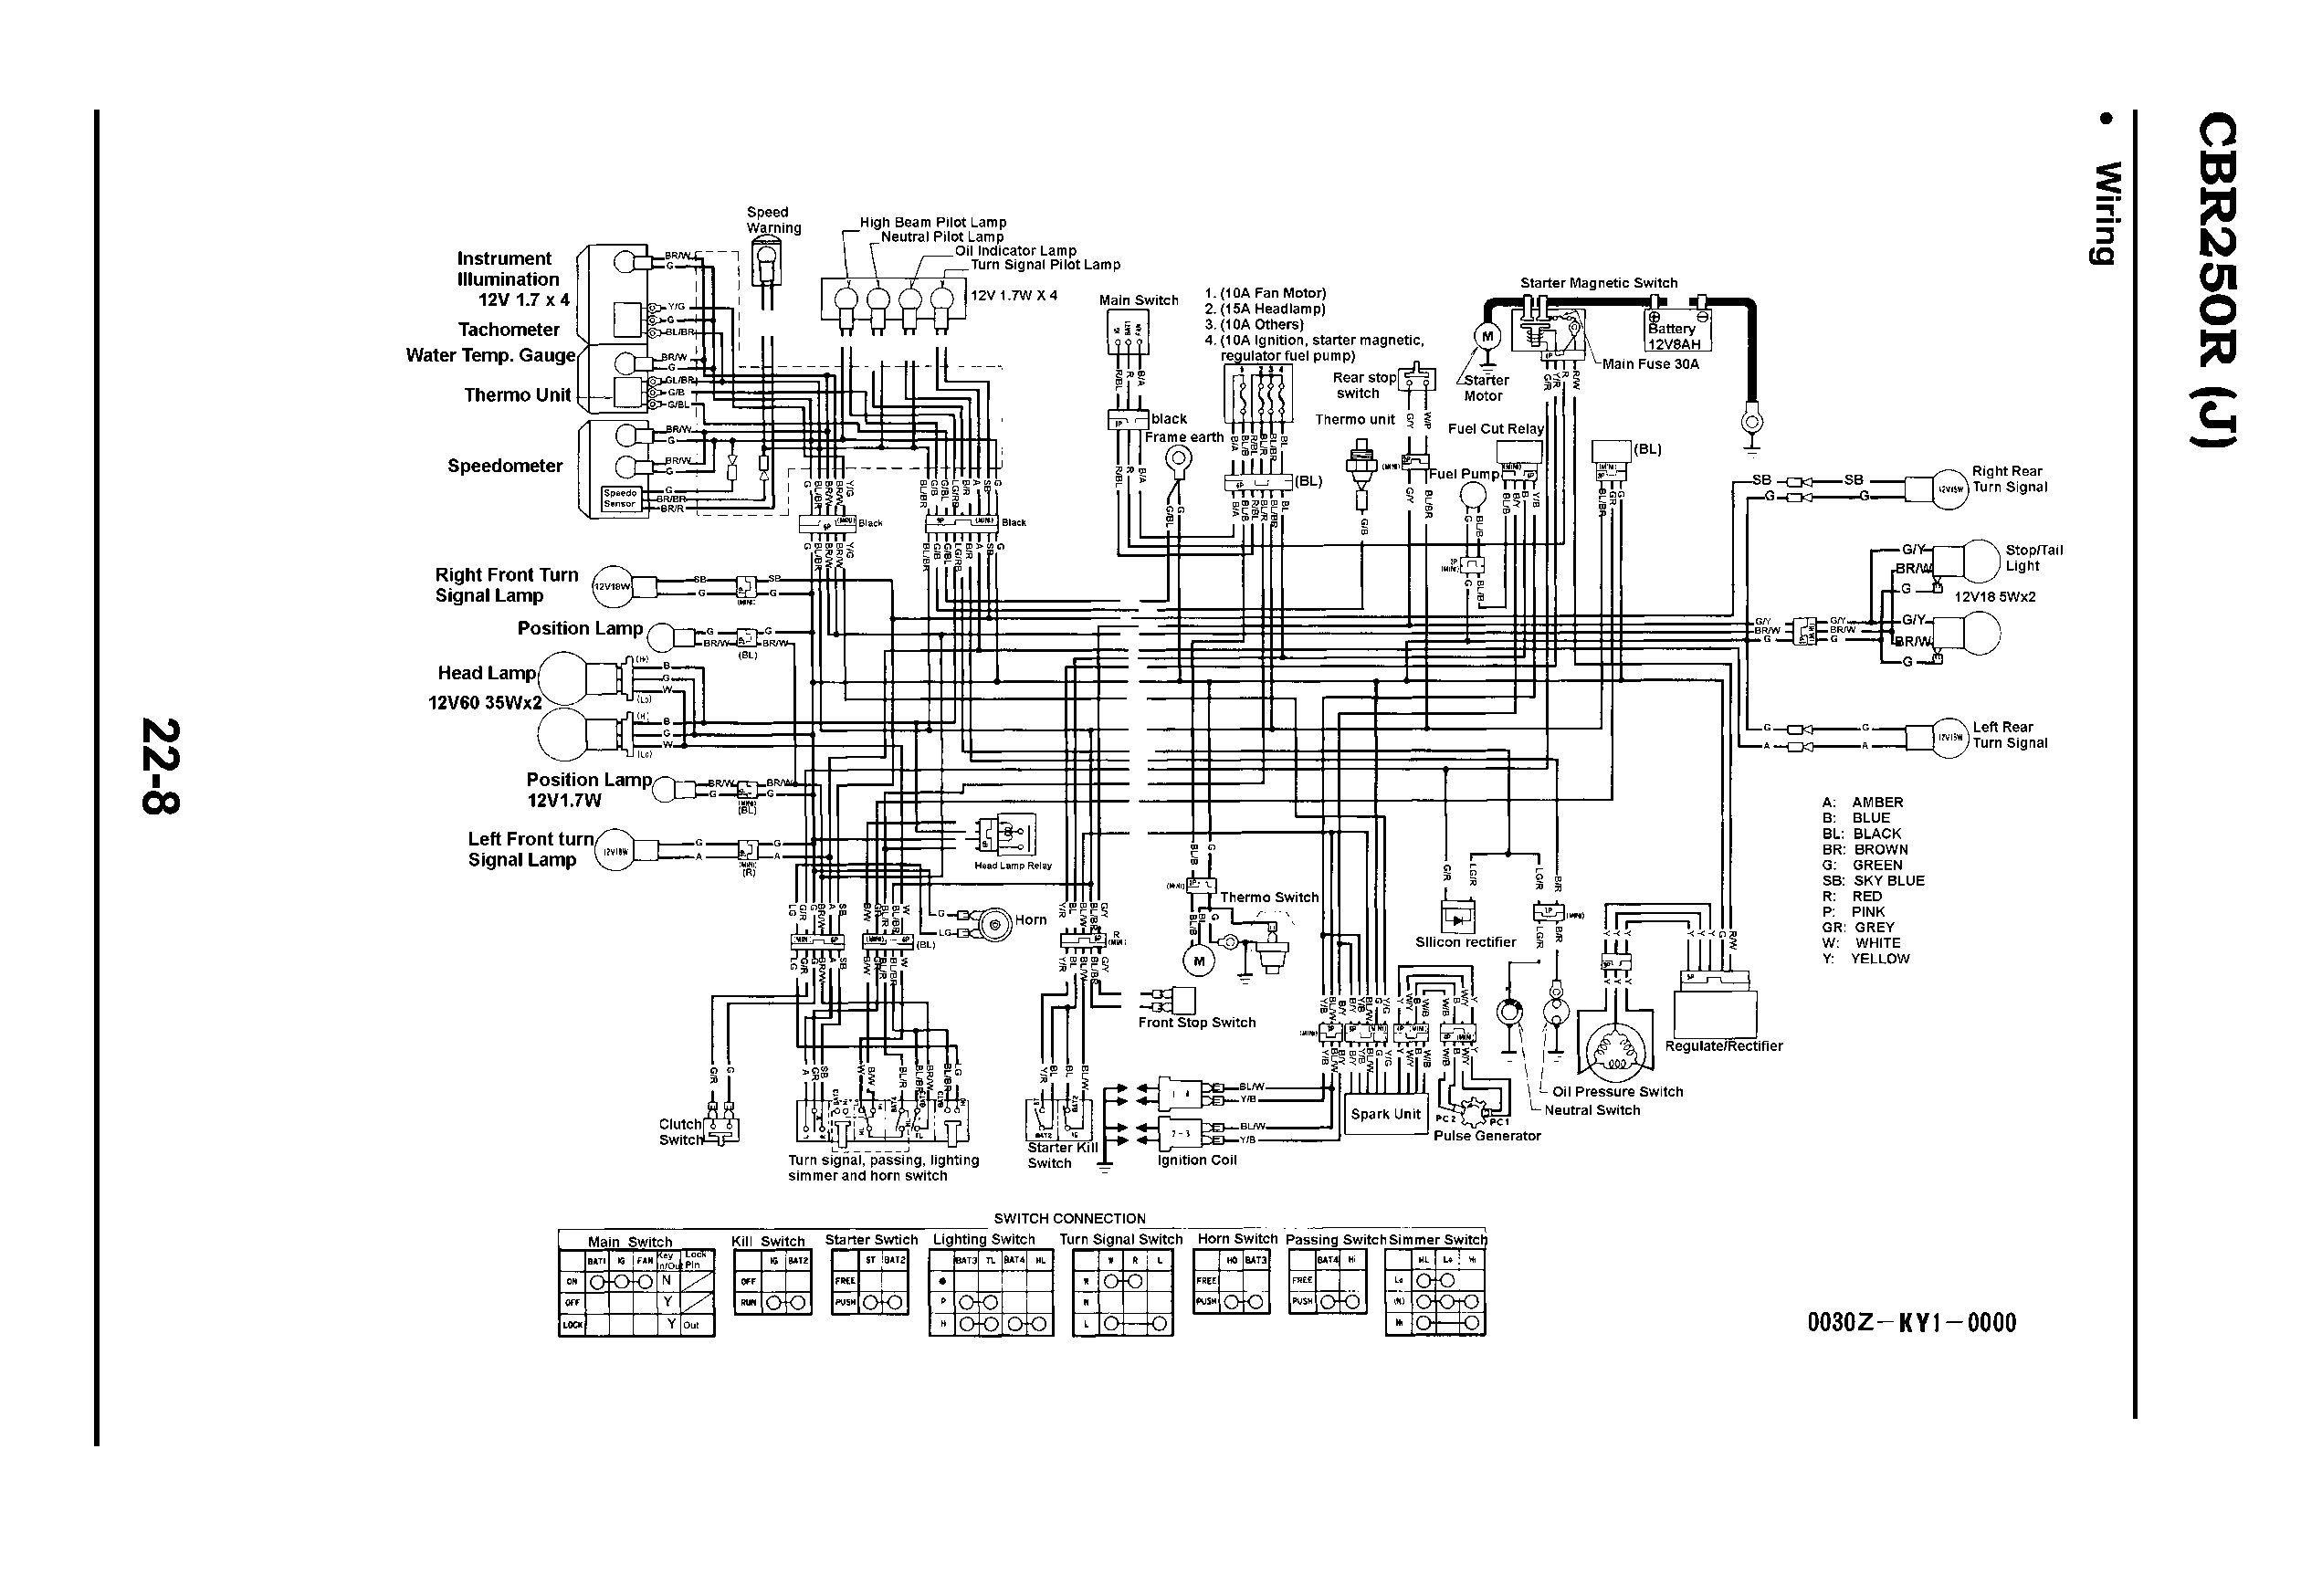 Cbr250 Wiring Diagram Data Residential Schematic 2011 Cbr1000rr Just Another Blog U2022 Diagrams